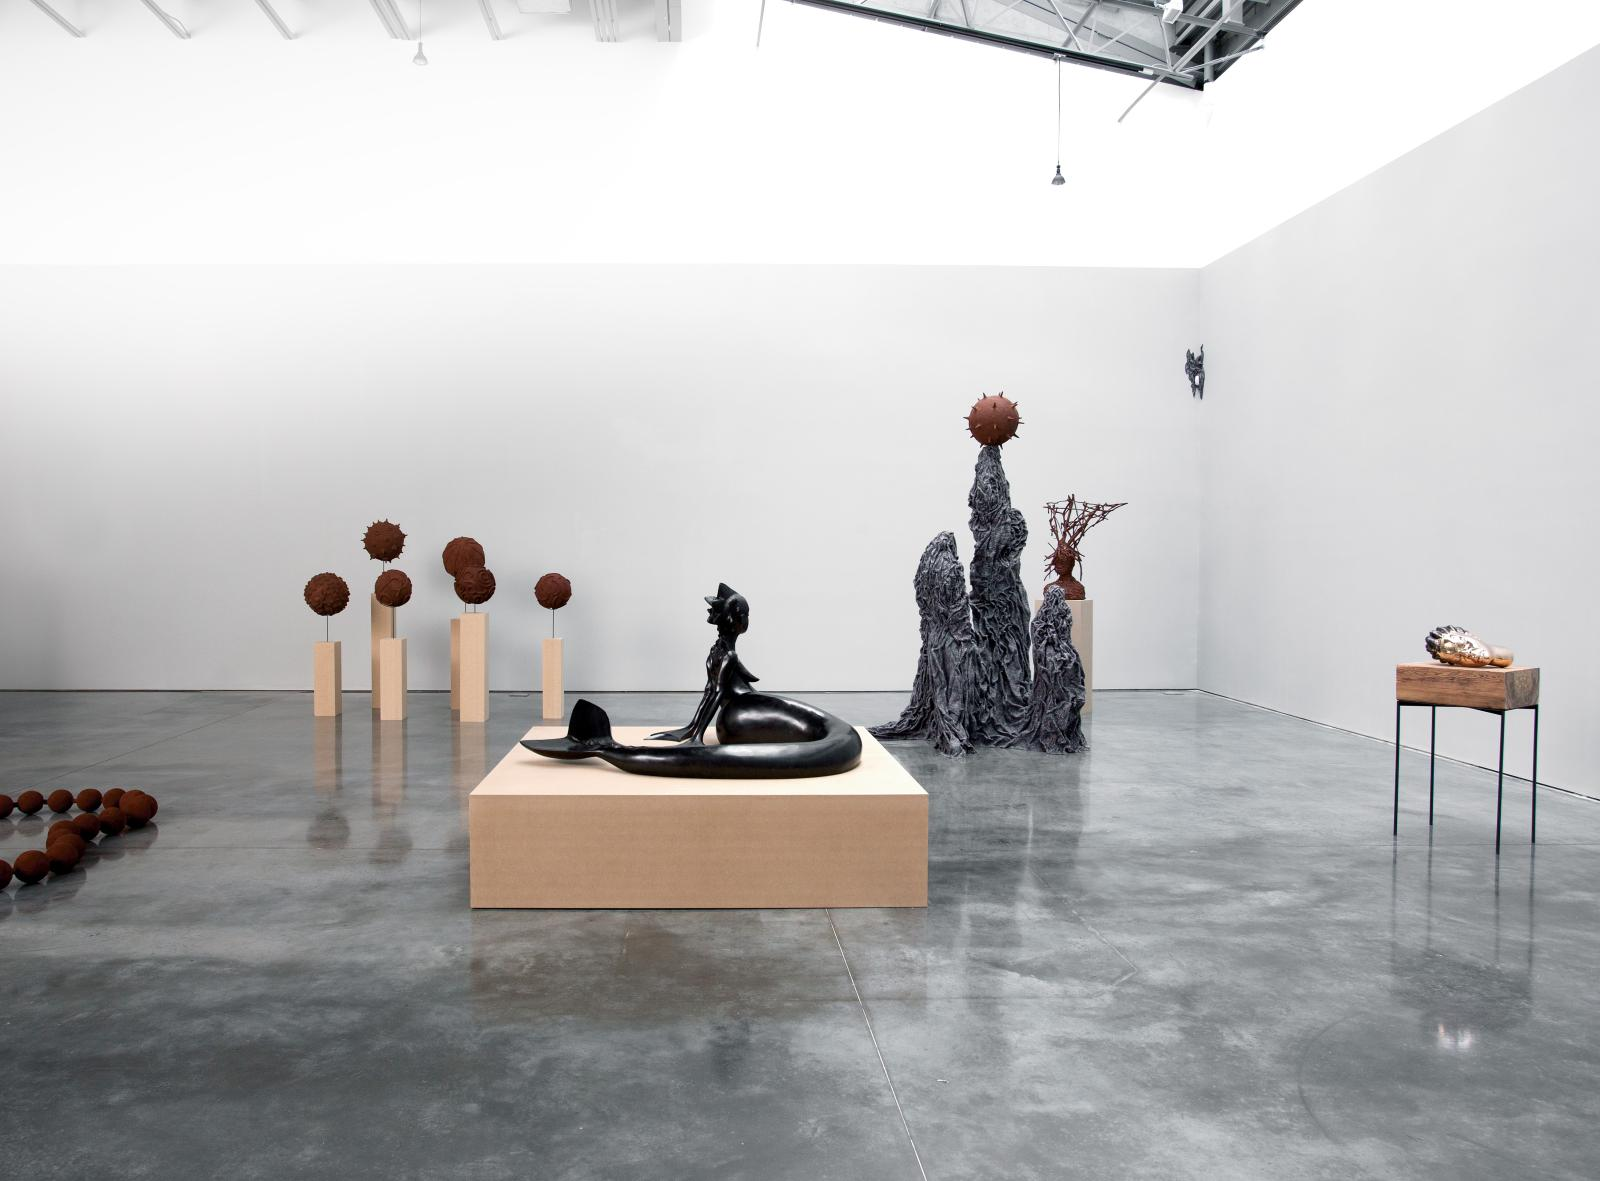 Wangechi Mutu (1972), Ndoro Na Miti, installation. © WANGECHI MUTU COURTESY GLADSTONE GALLERY